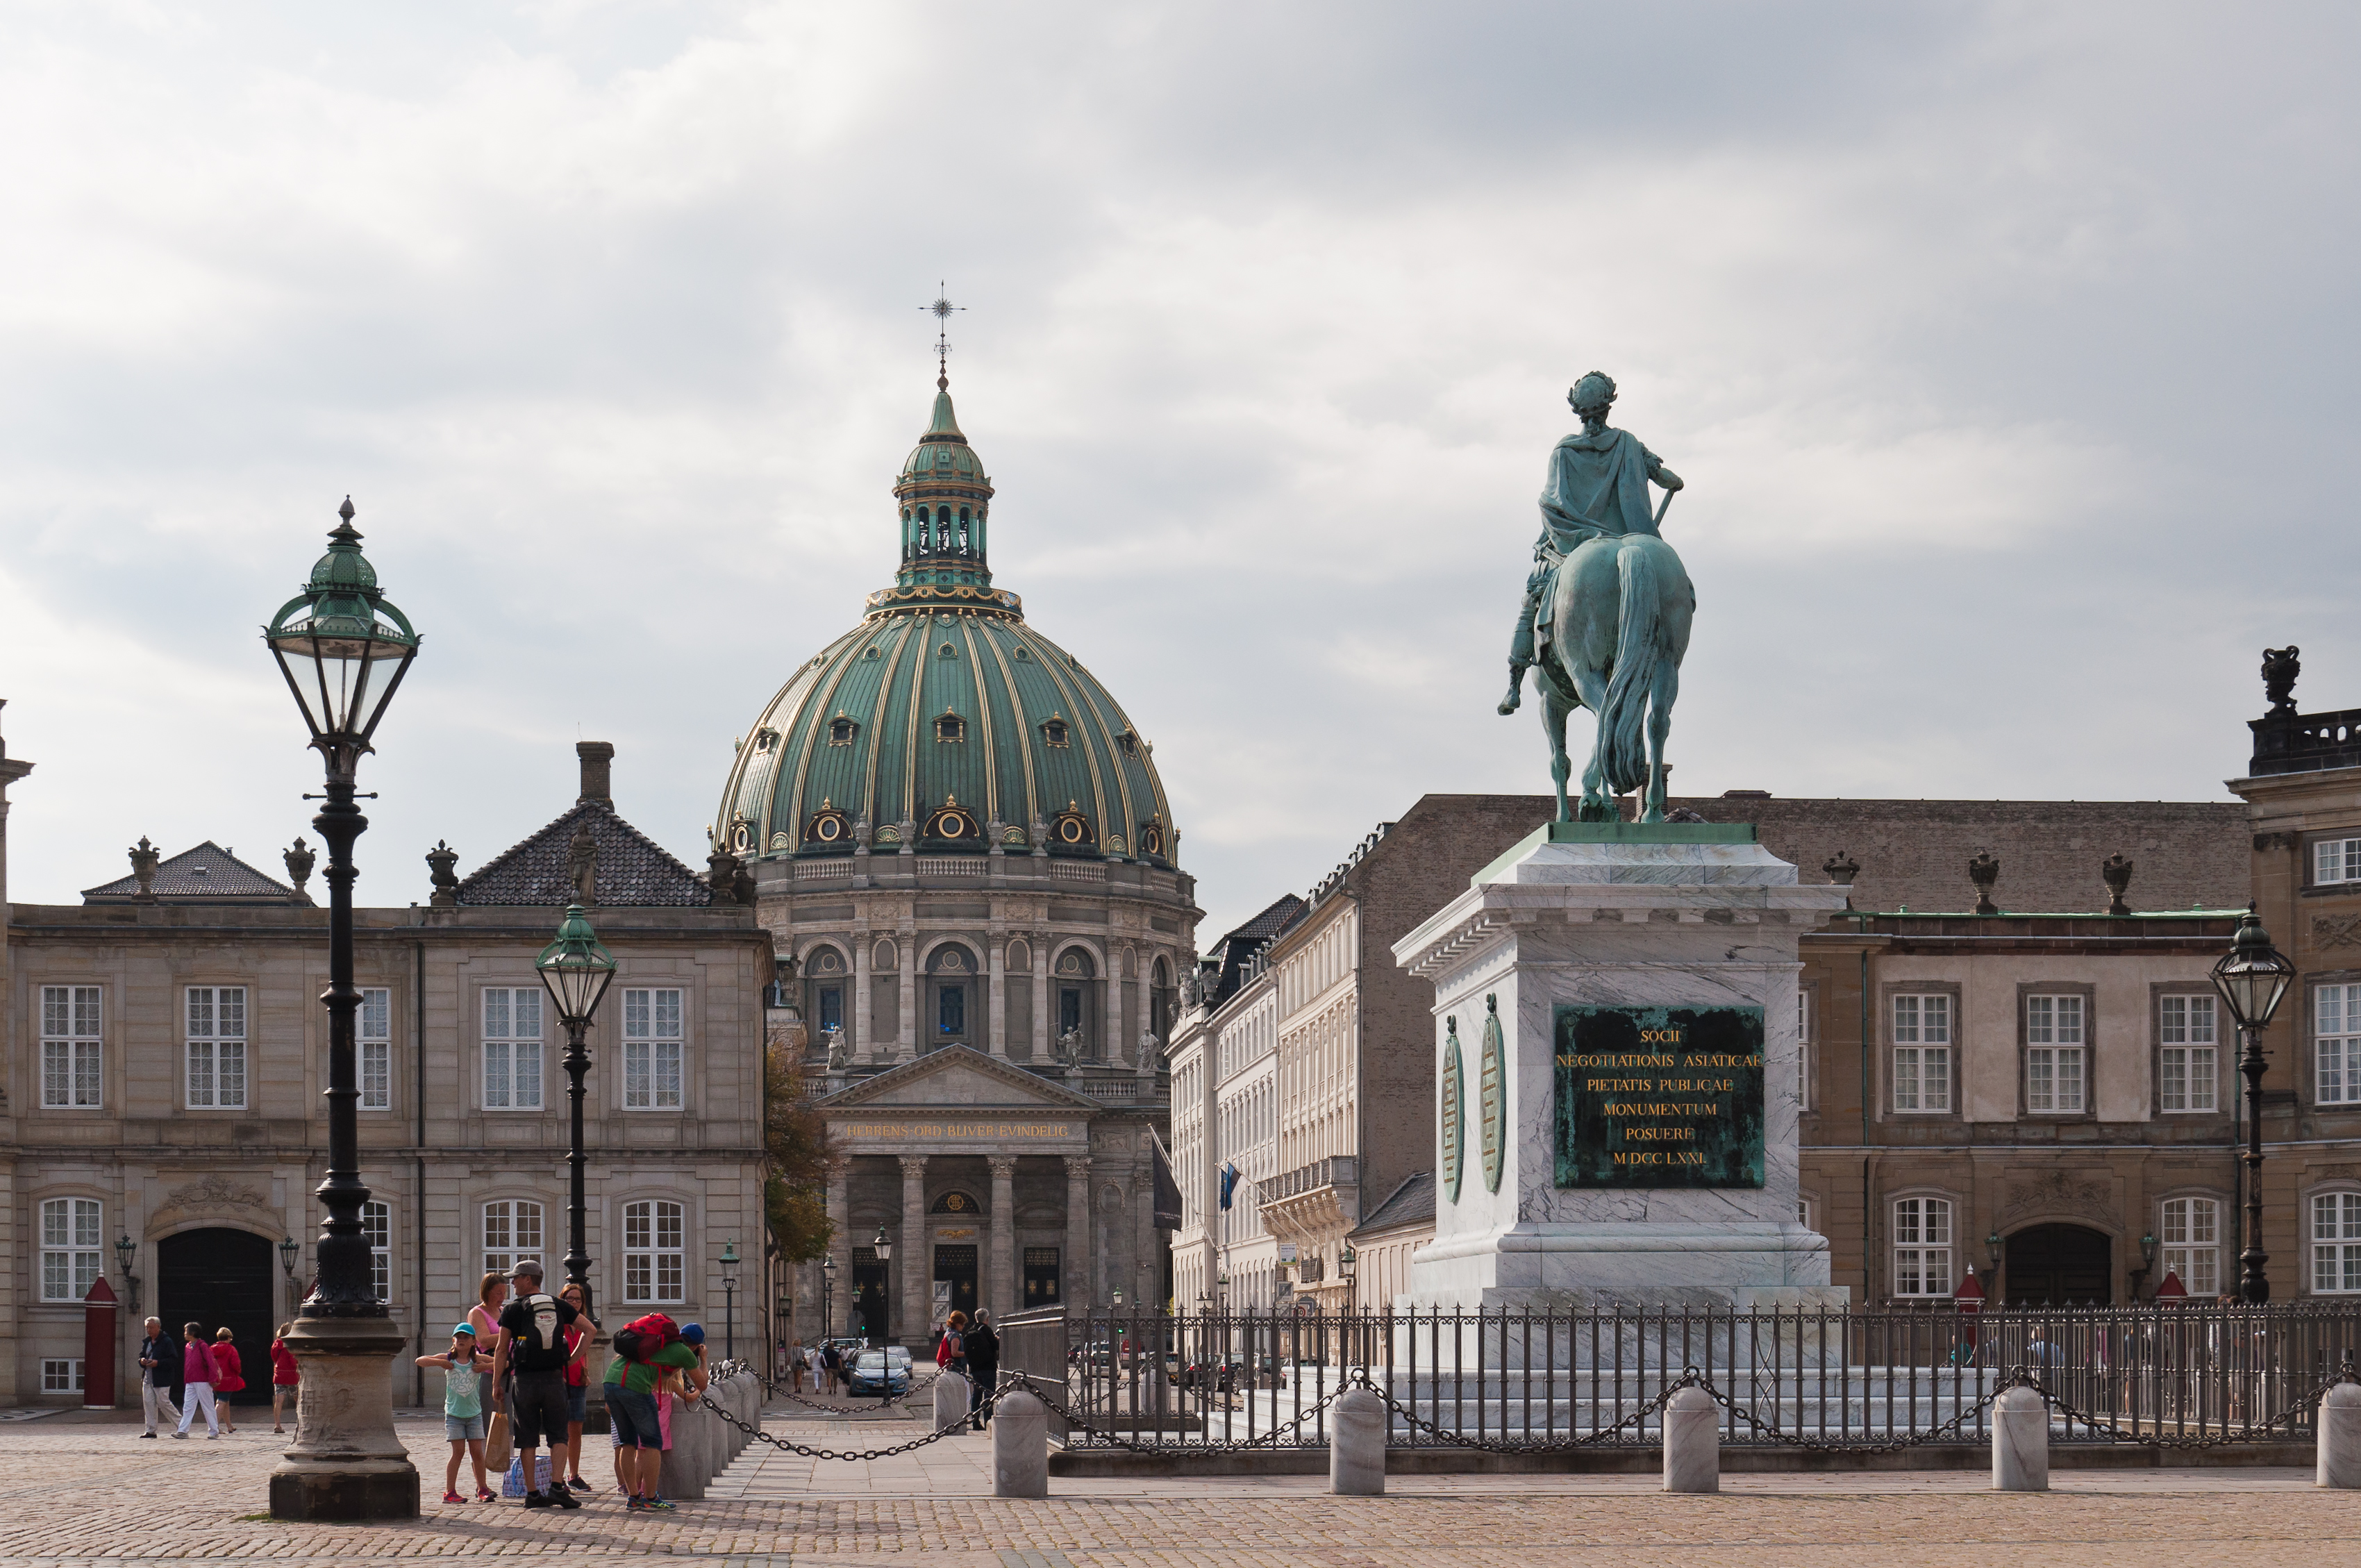 ... in Amalienborg Palace and Frederik's Church Copenhagen 2014 01.jpg